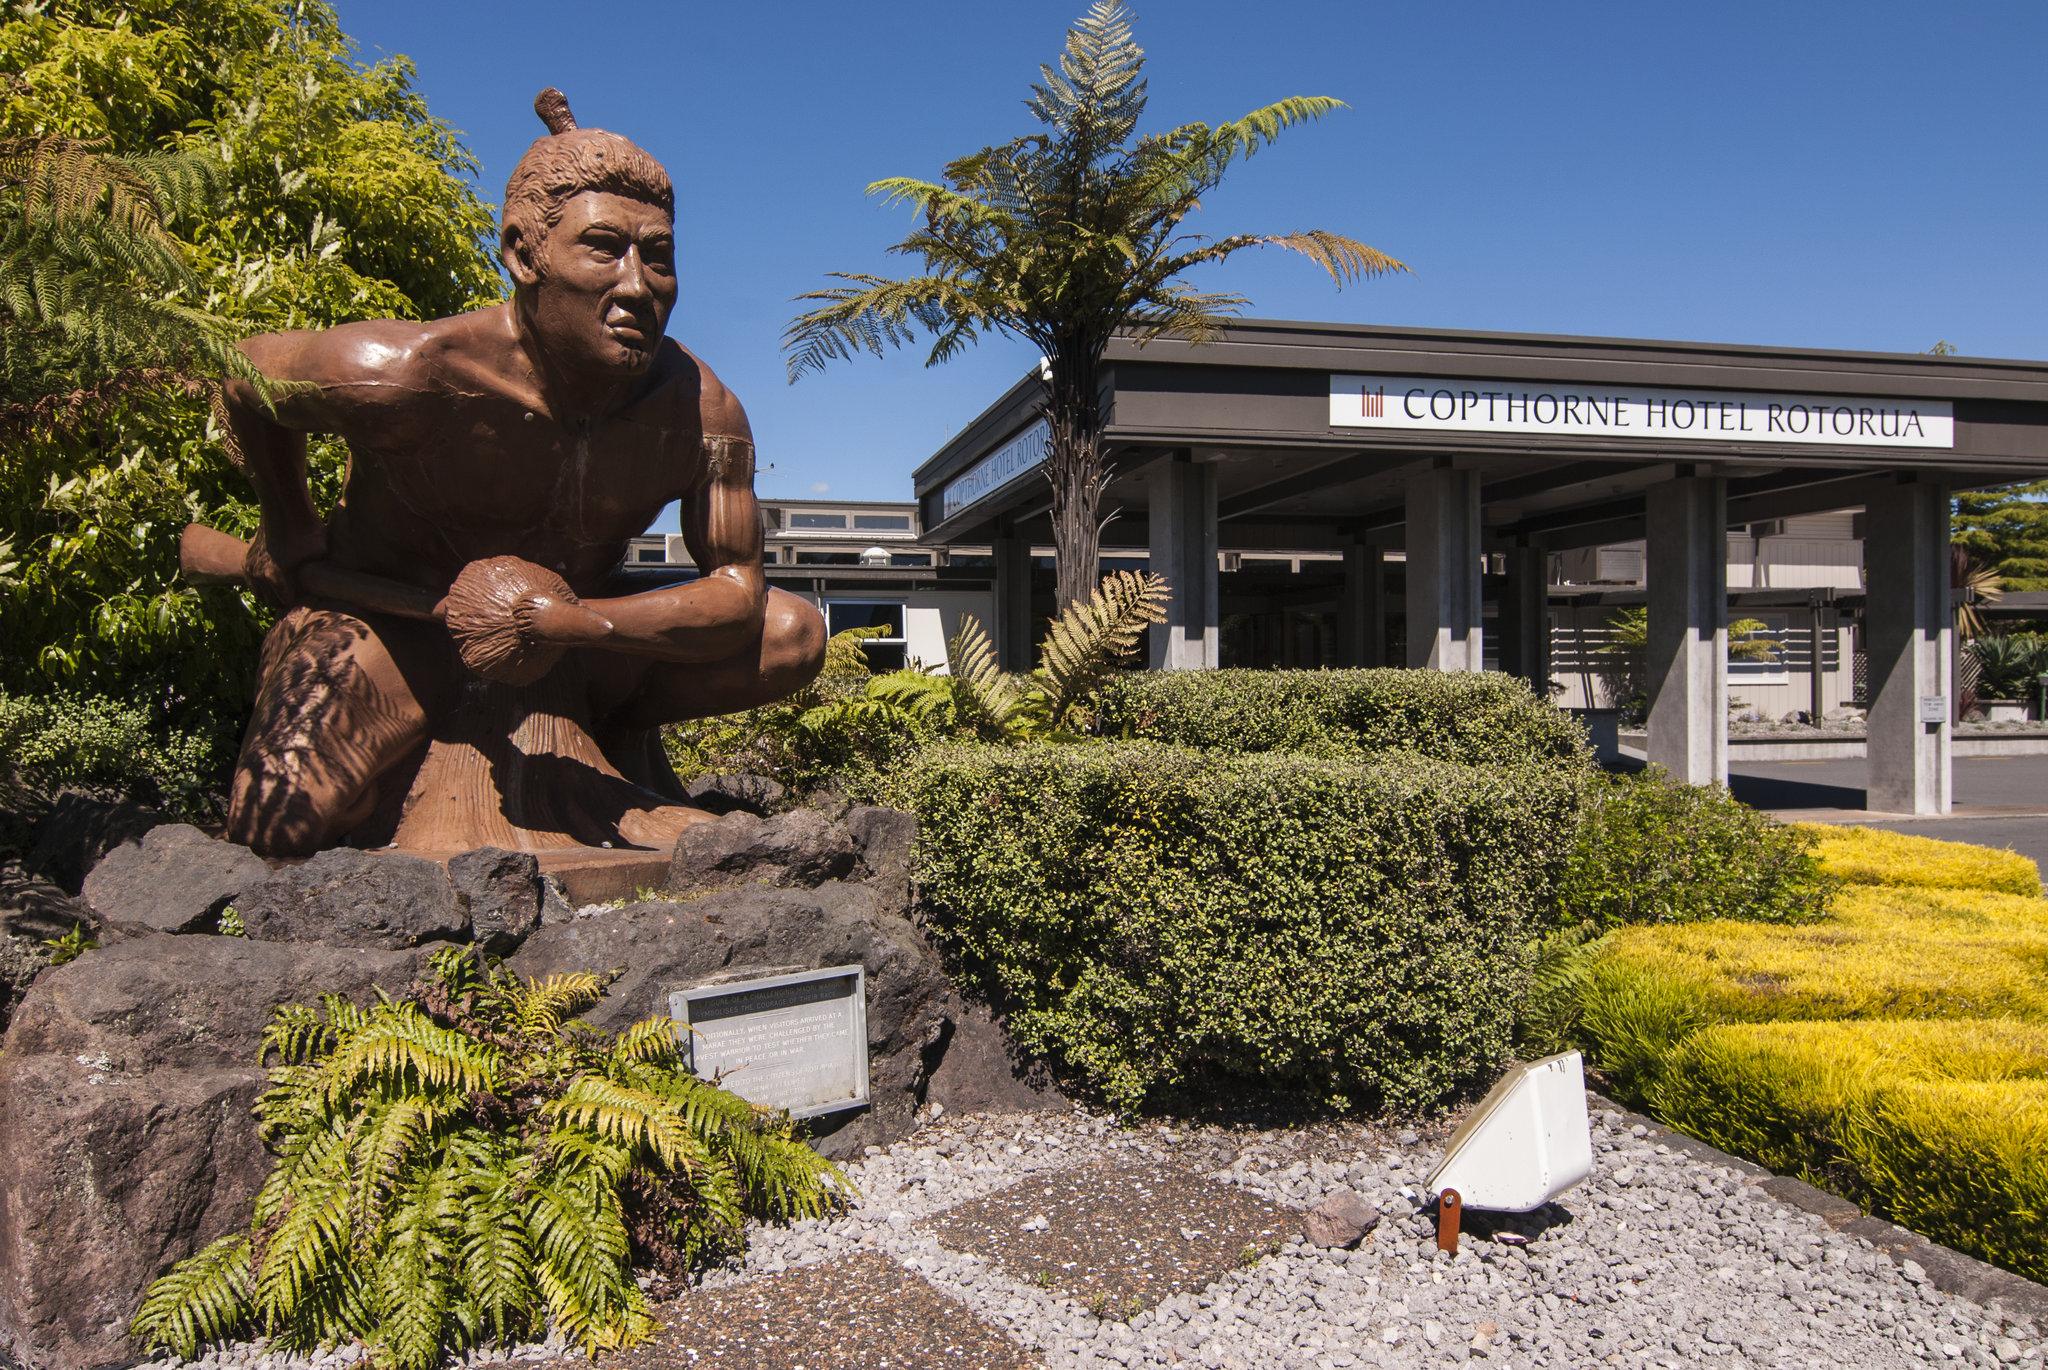 Copthorne Rotorua